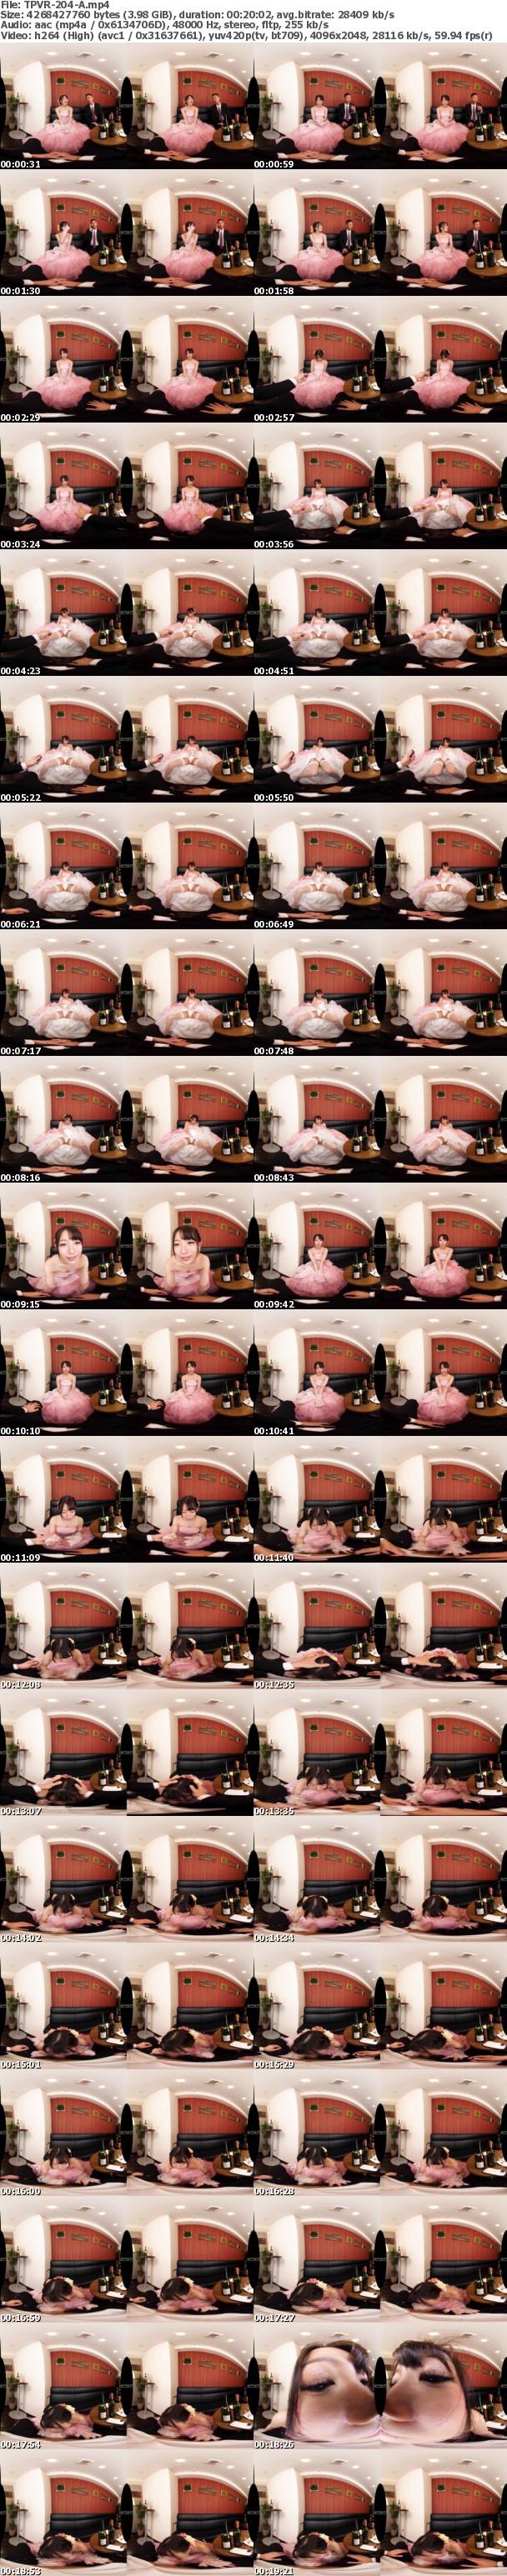 (VR) TPVR-204 HQ60fps NTR結婚式 友達の花嫁は調教済み 式当日に完全服従中出しSEX